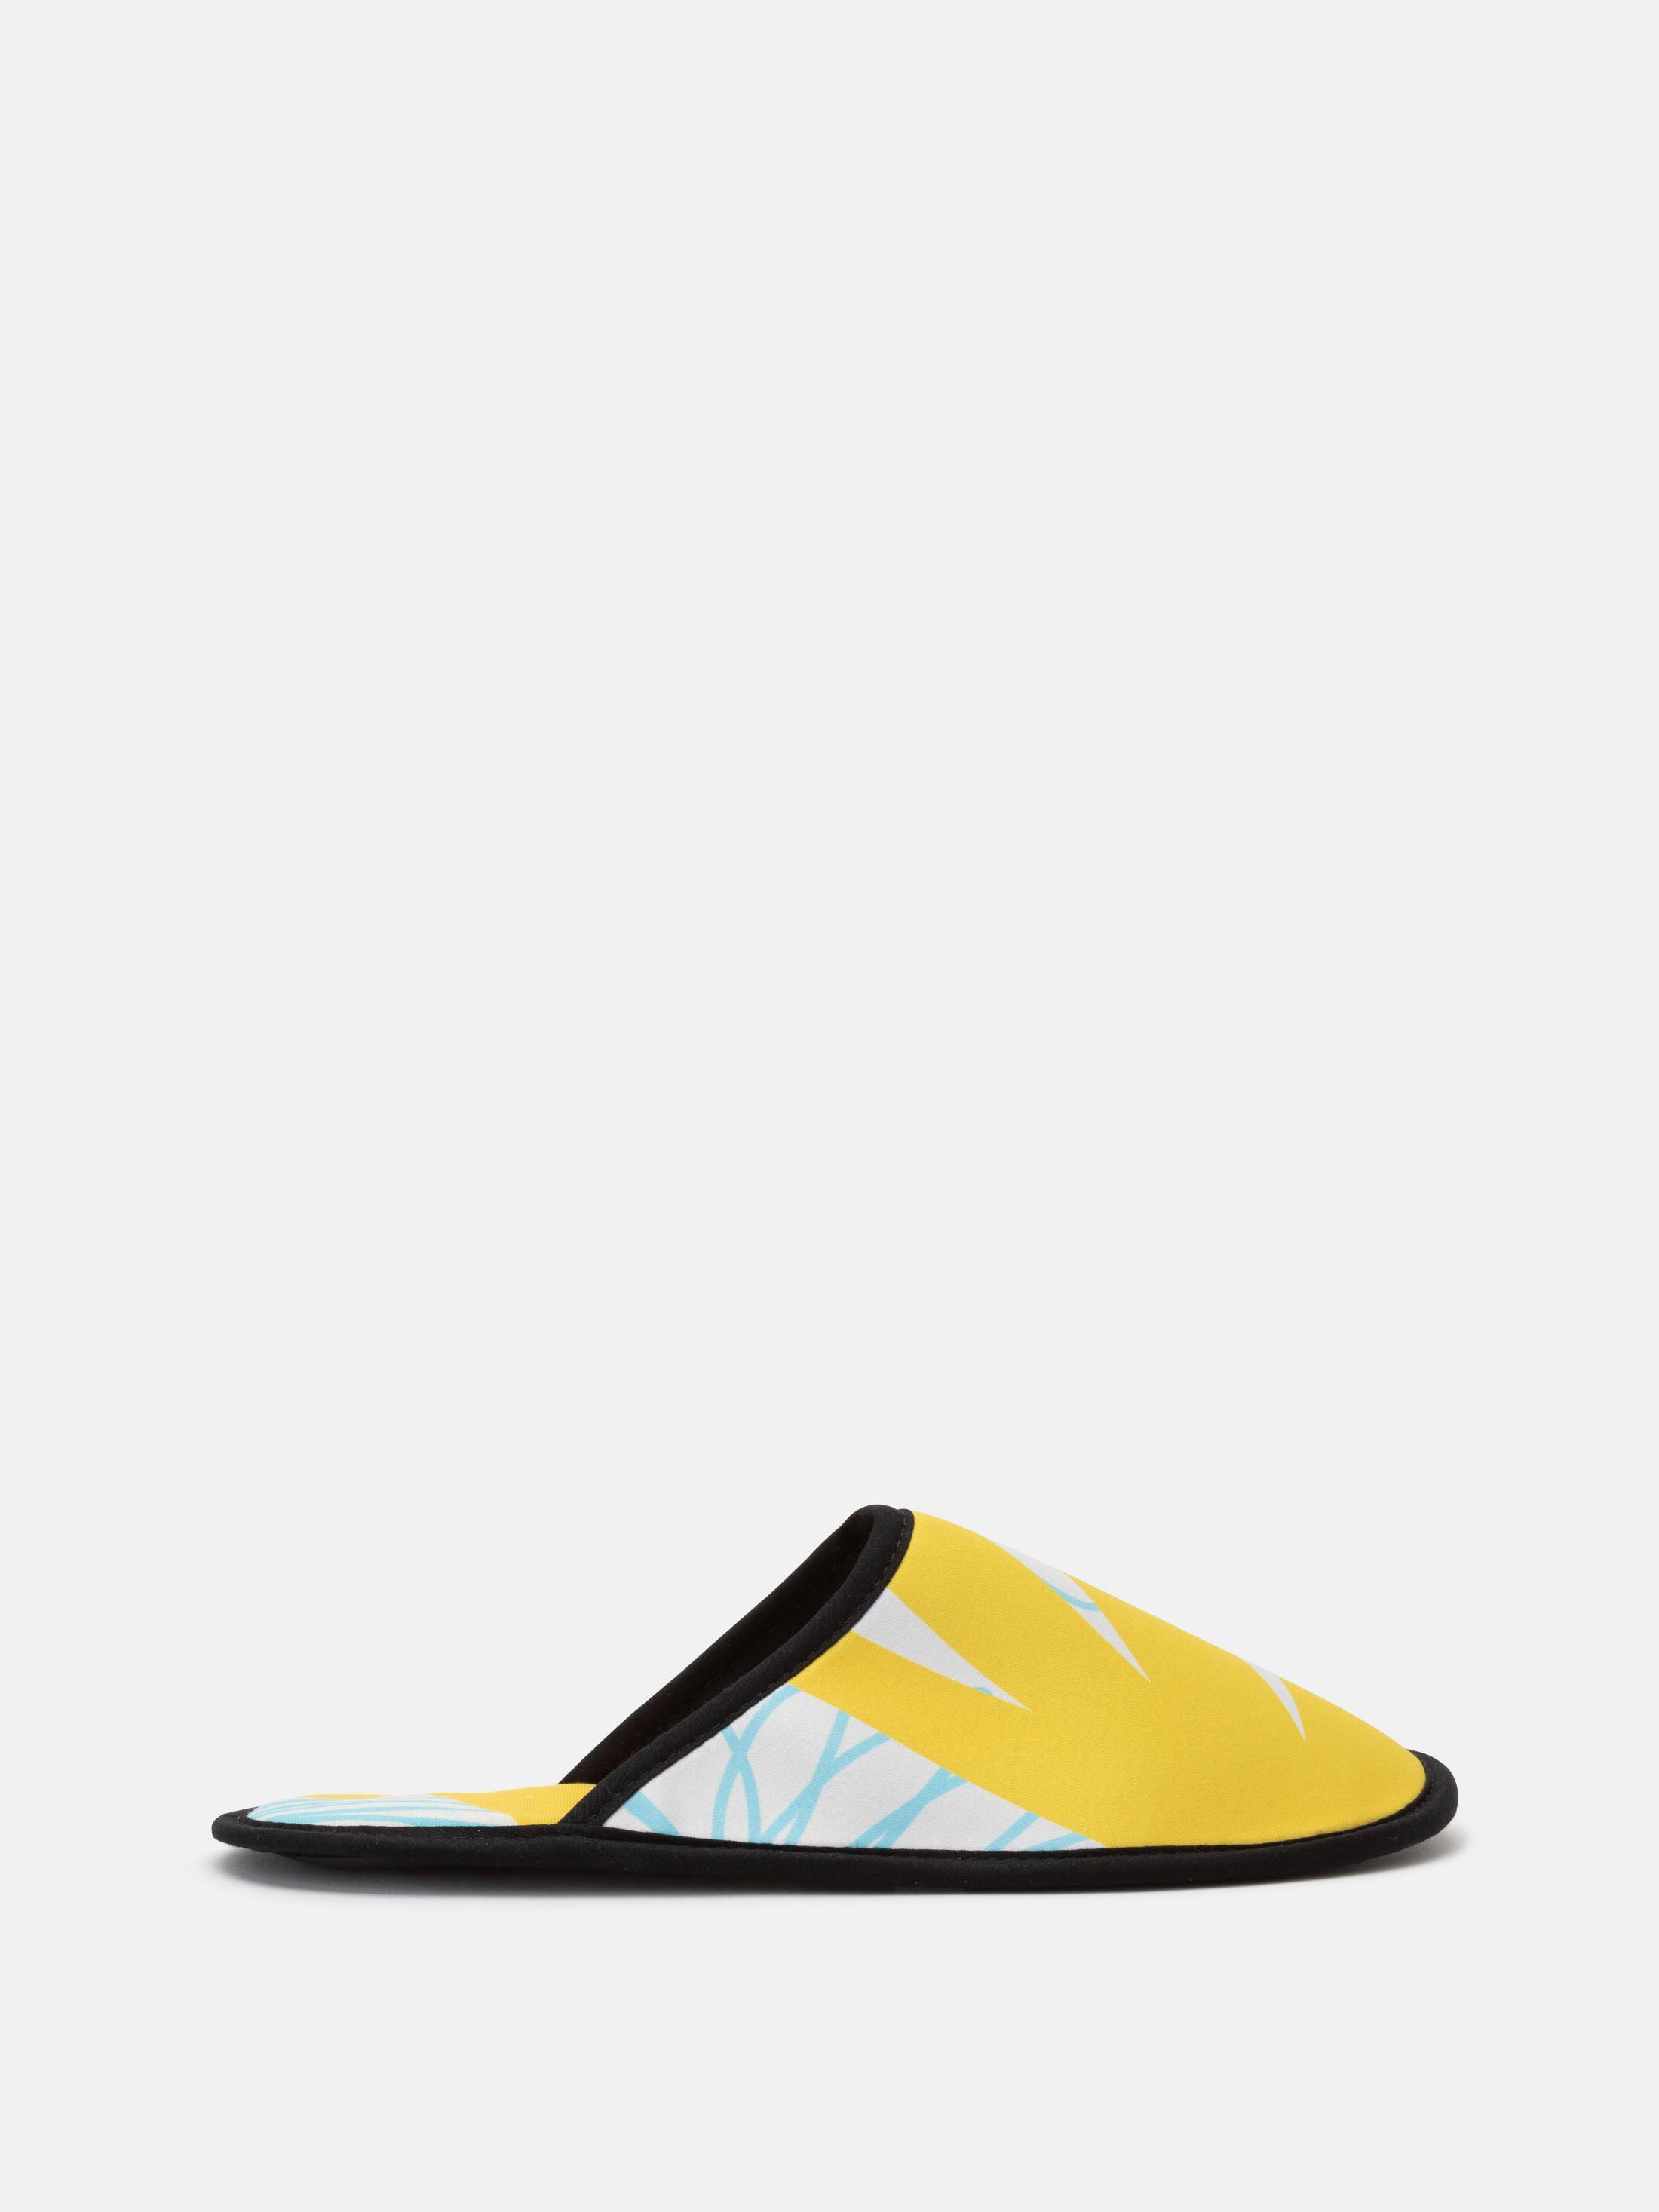 Artist designed beautiful slippers custom made